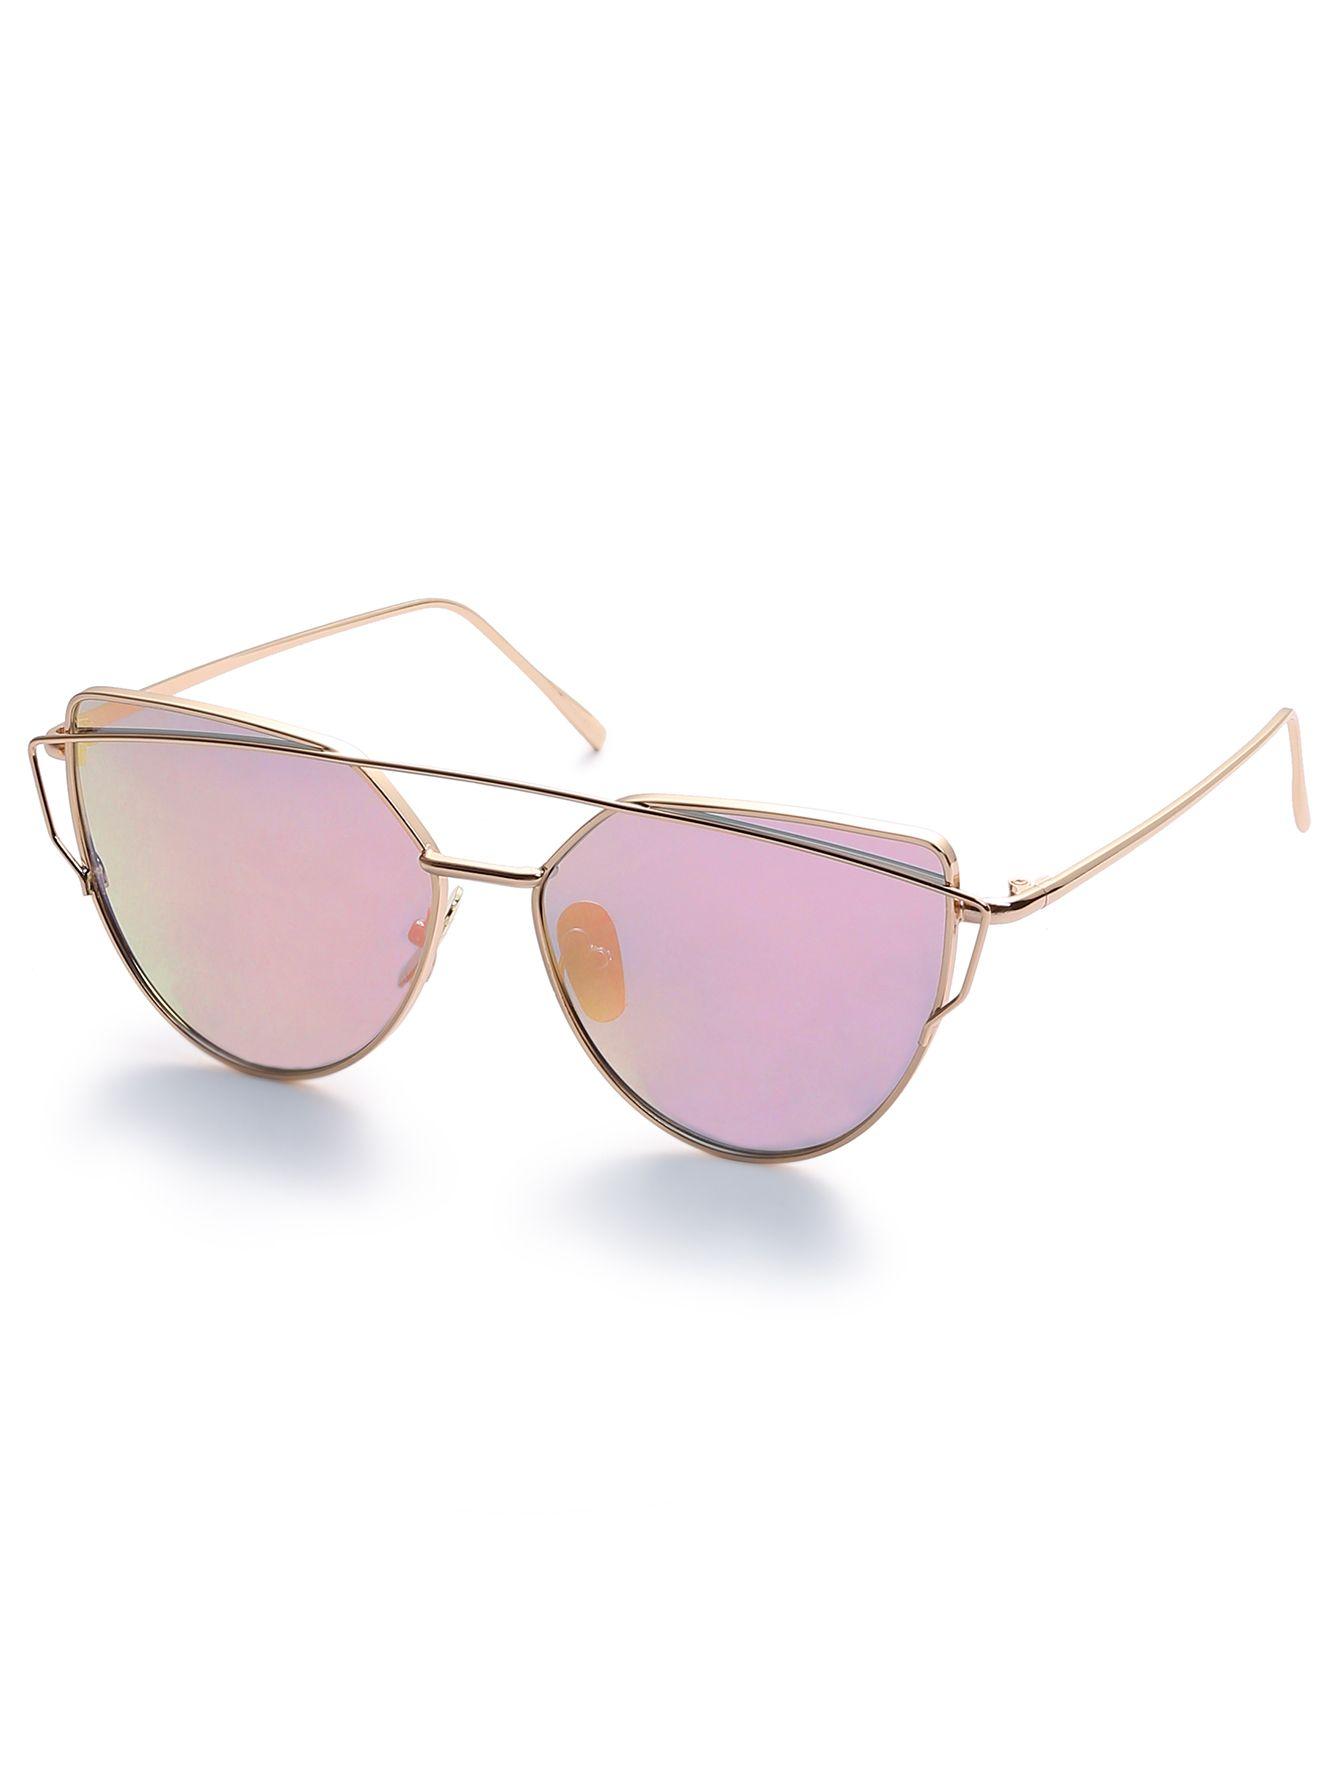 f18daecc7c Gold Metal Frame Double Bridge Pink Lens Sunglasses | Bags and ...